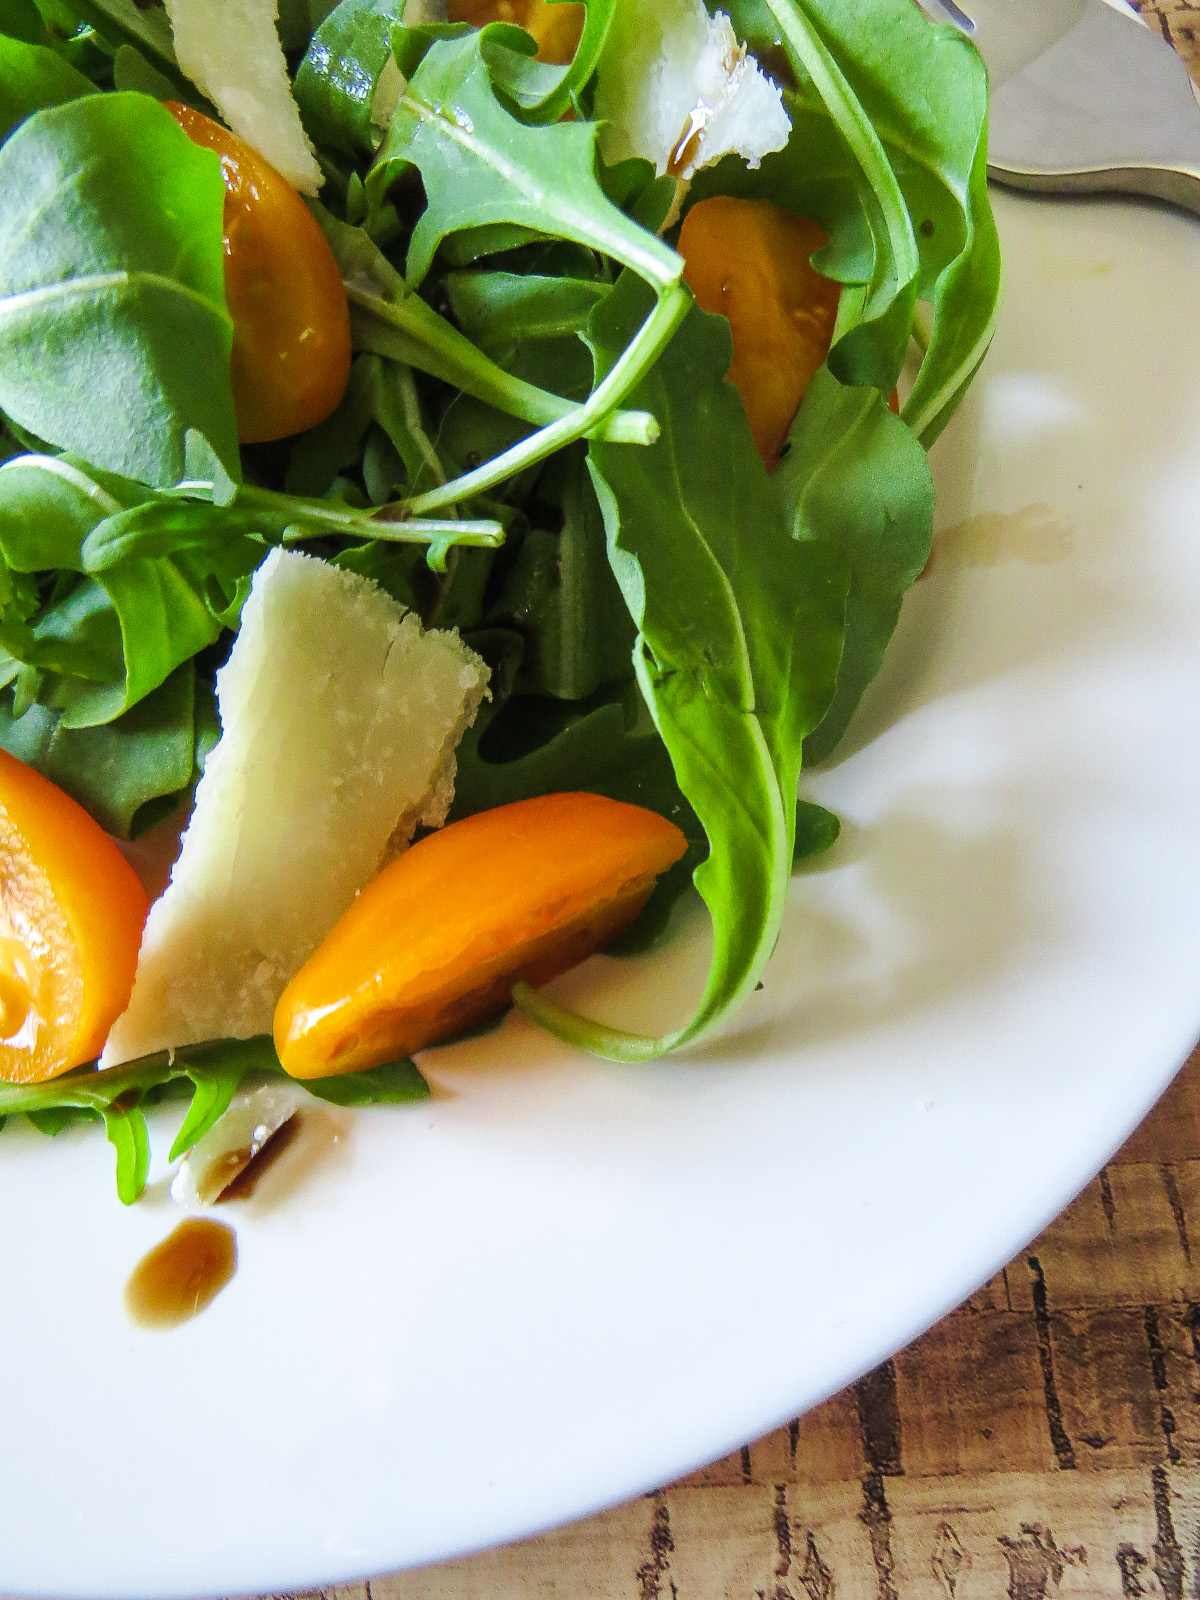 Arugula Salad with Balsamic Vinaigrette - Magic happens with arugula salad is drizzled with a balsamic vinaigrette, and its made even better with some additions!